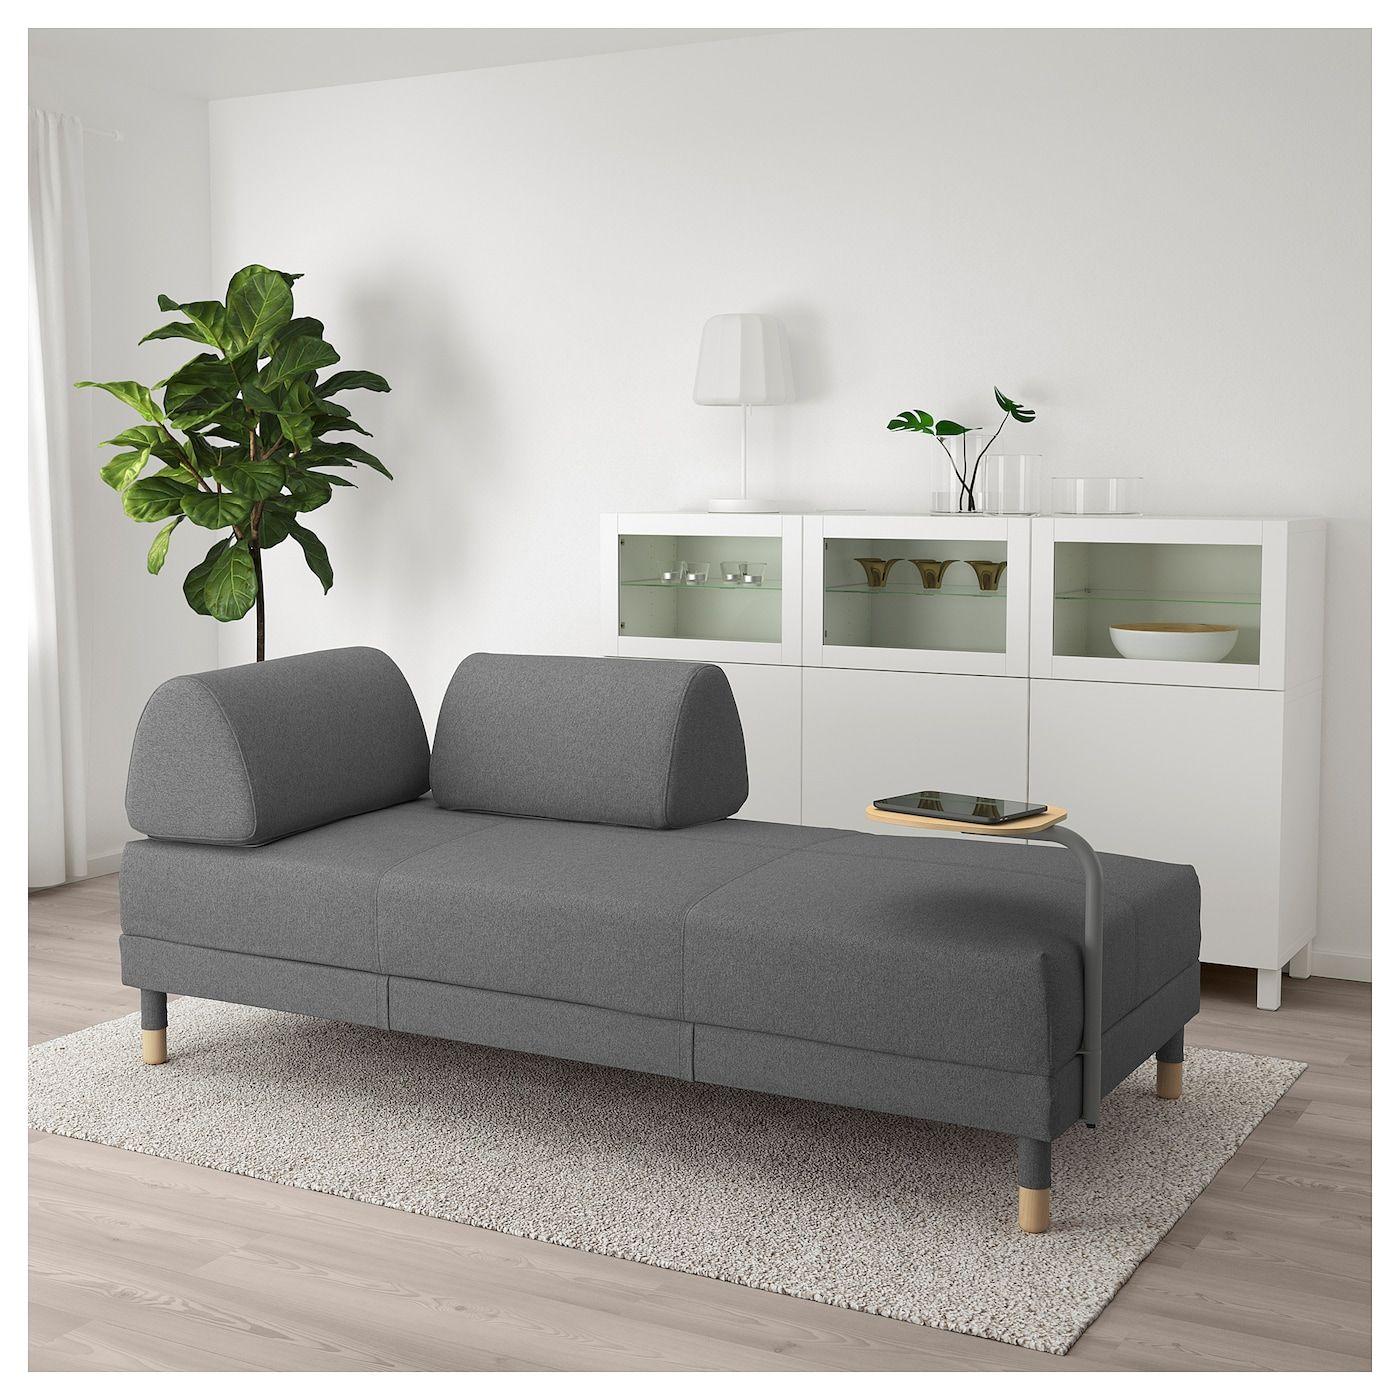 Flottebo Side Table 12 5 8x10 5 8 32x27 Cm Bettsofa Beistelltisch Sofa